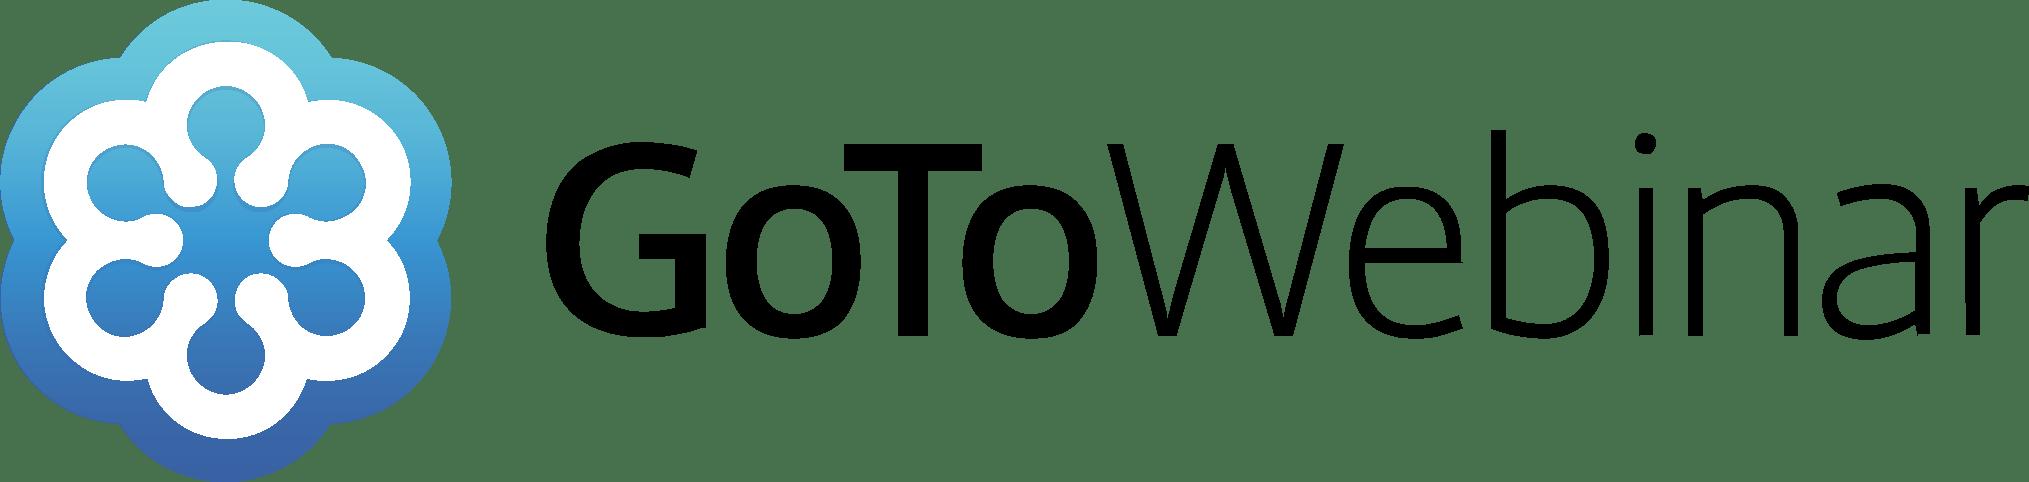 GotoWebinar Logo png